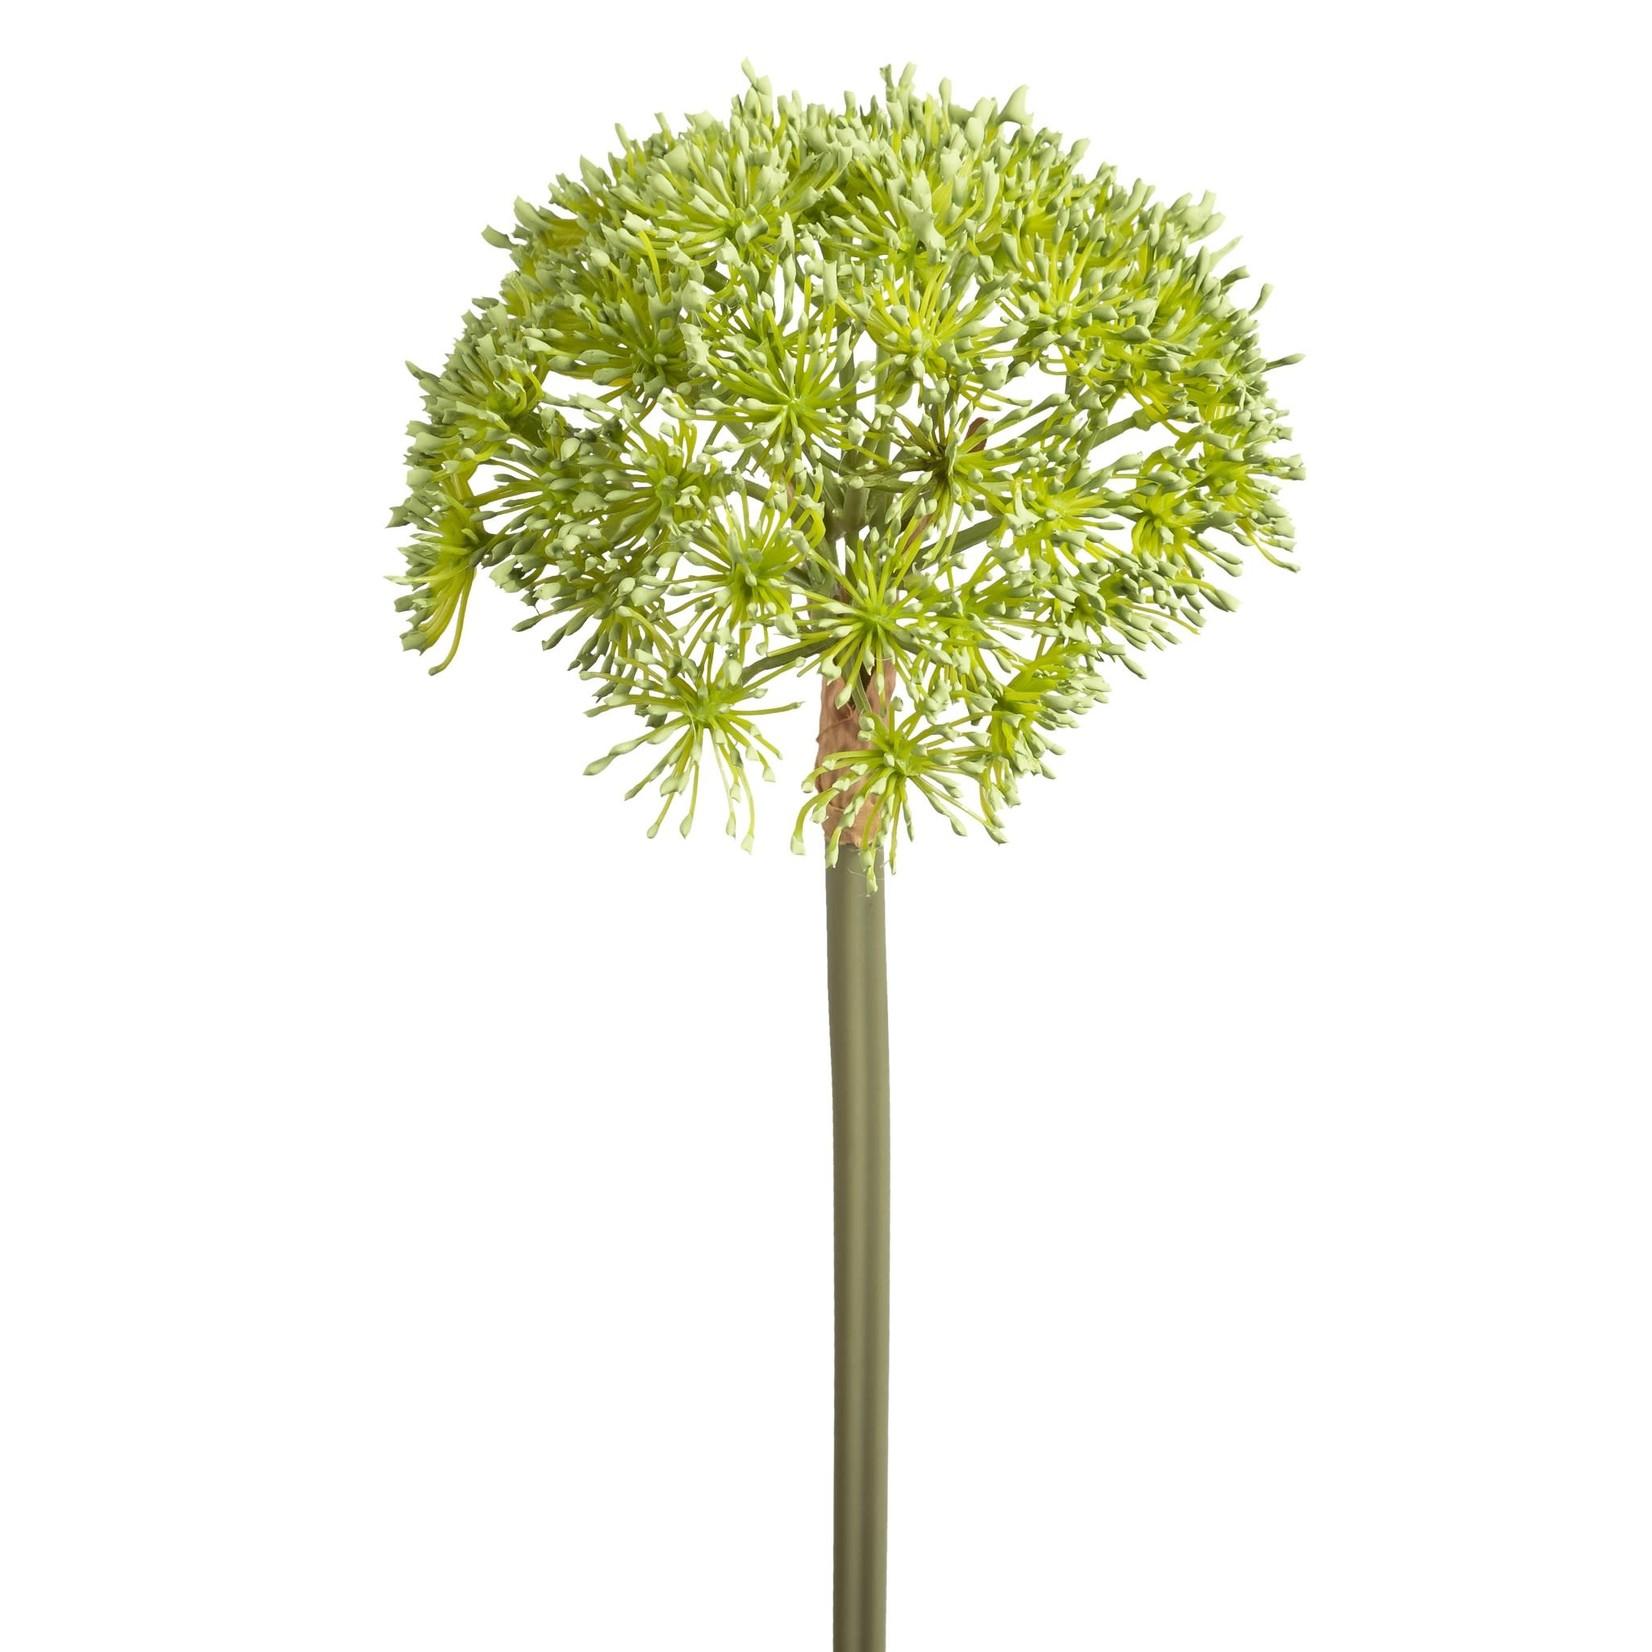 Torre & Tagus Buddleia Bloom 26in Stem Green